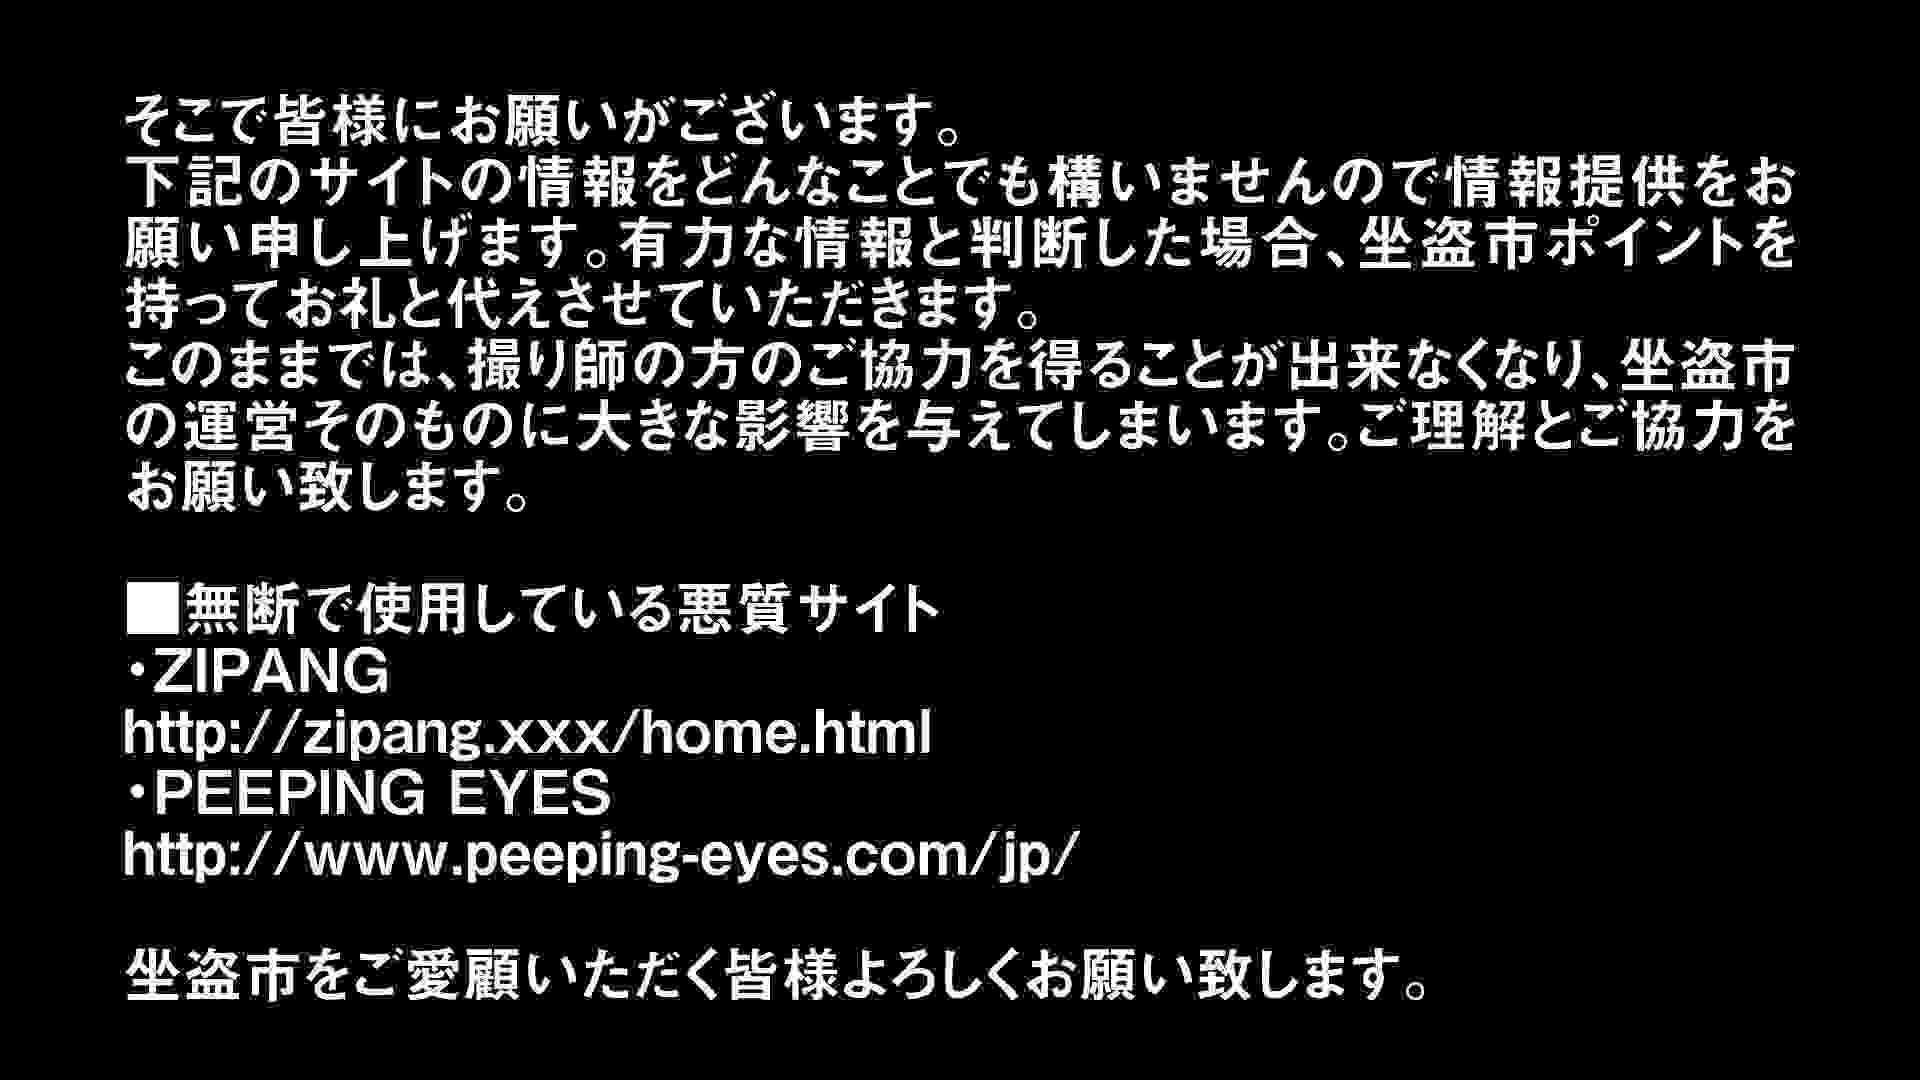 Aquaな露天風呂Vol.296 盗撮シリーズ   露天風呂編  102PIX 45